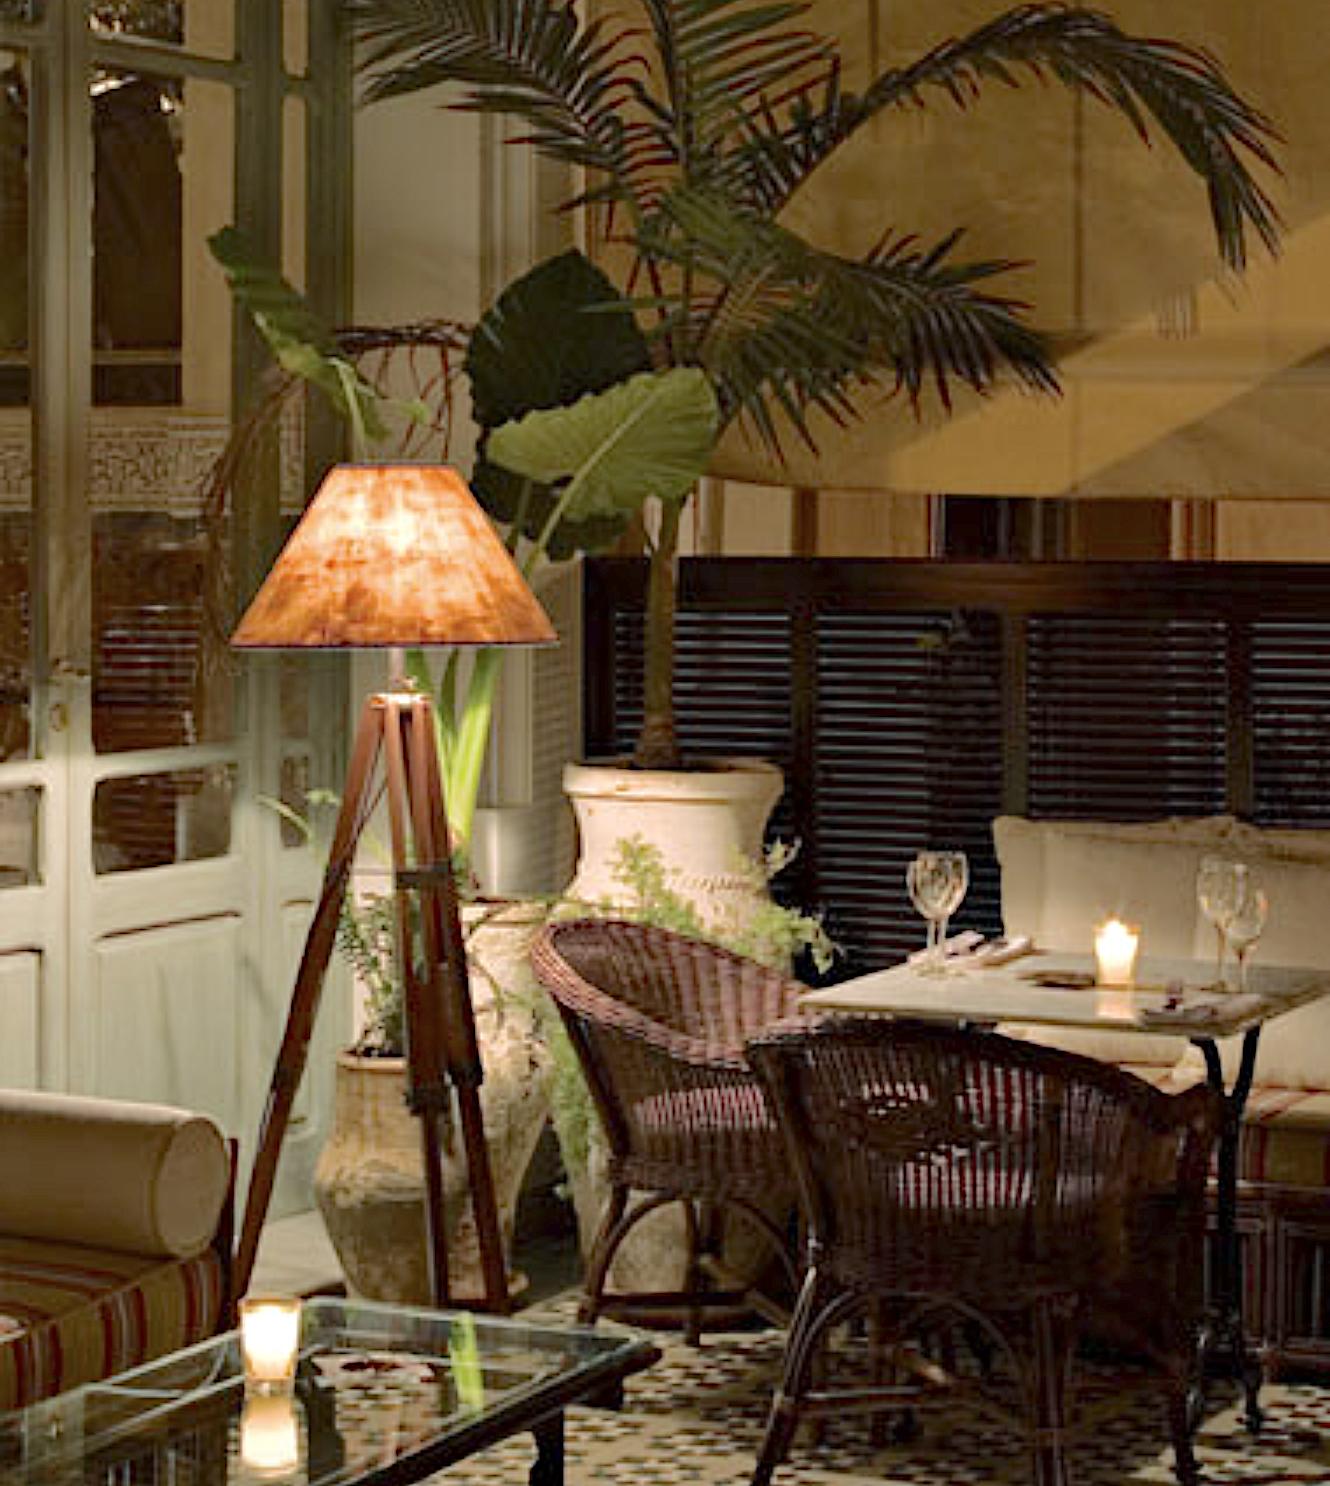 Melissa Lighting British Colonial Tropical Palm Tree Outdoor Series Deep Discount Lighting Palm Trees British